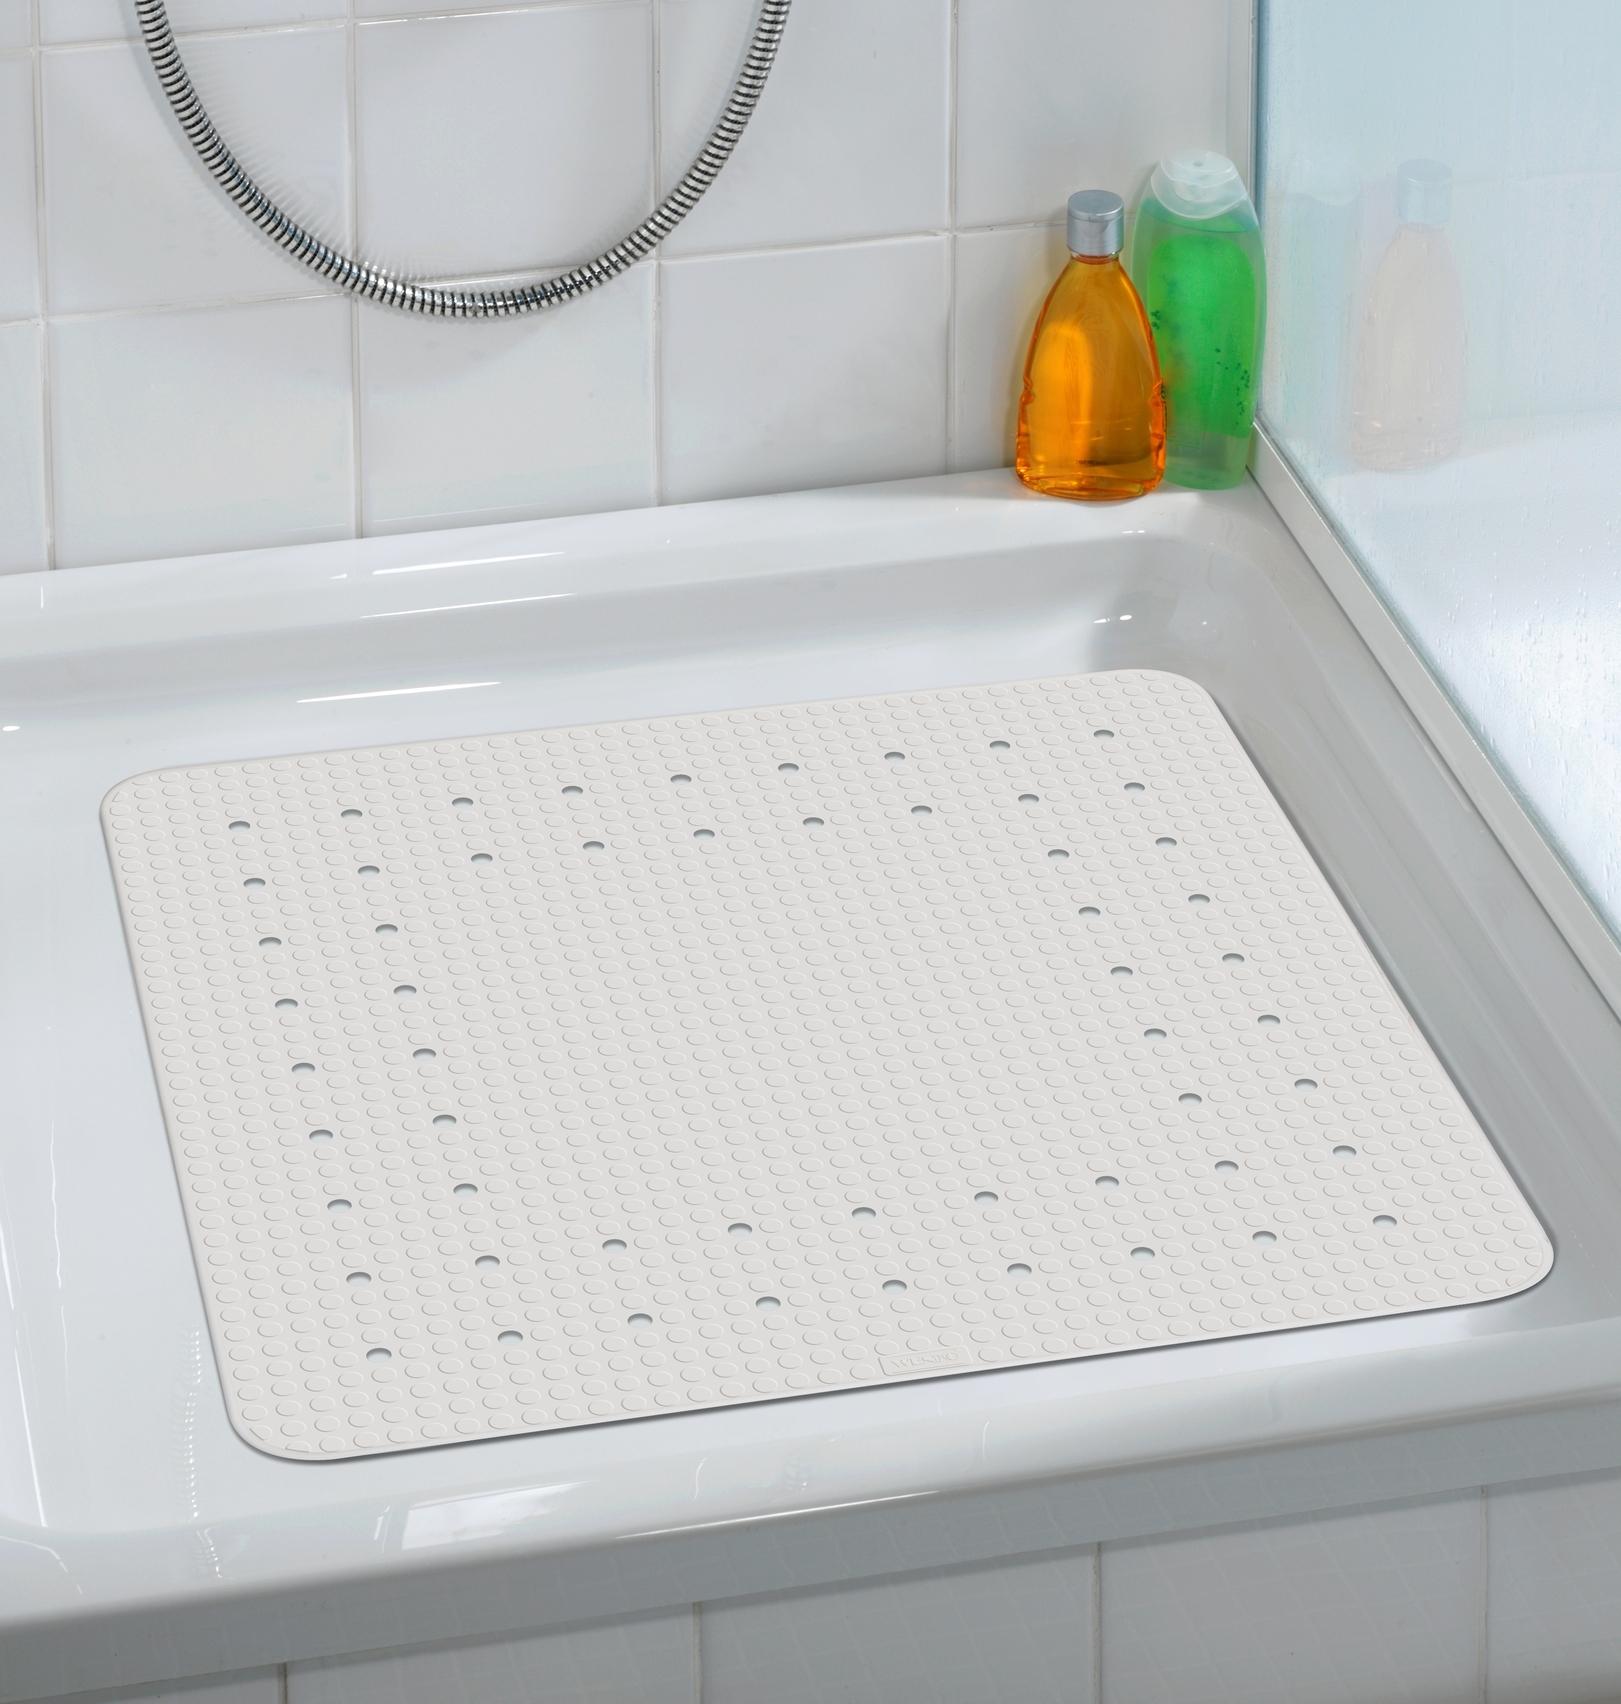 Covoras pentru baie antiderapant, din TPR, Mirasol Alb, 54 x 54 cm imagine